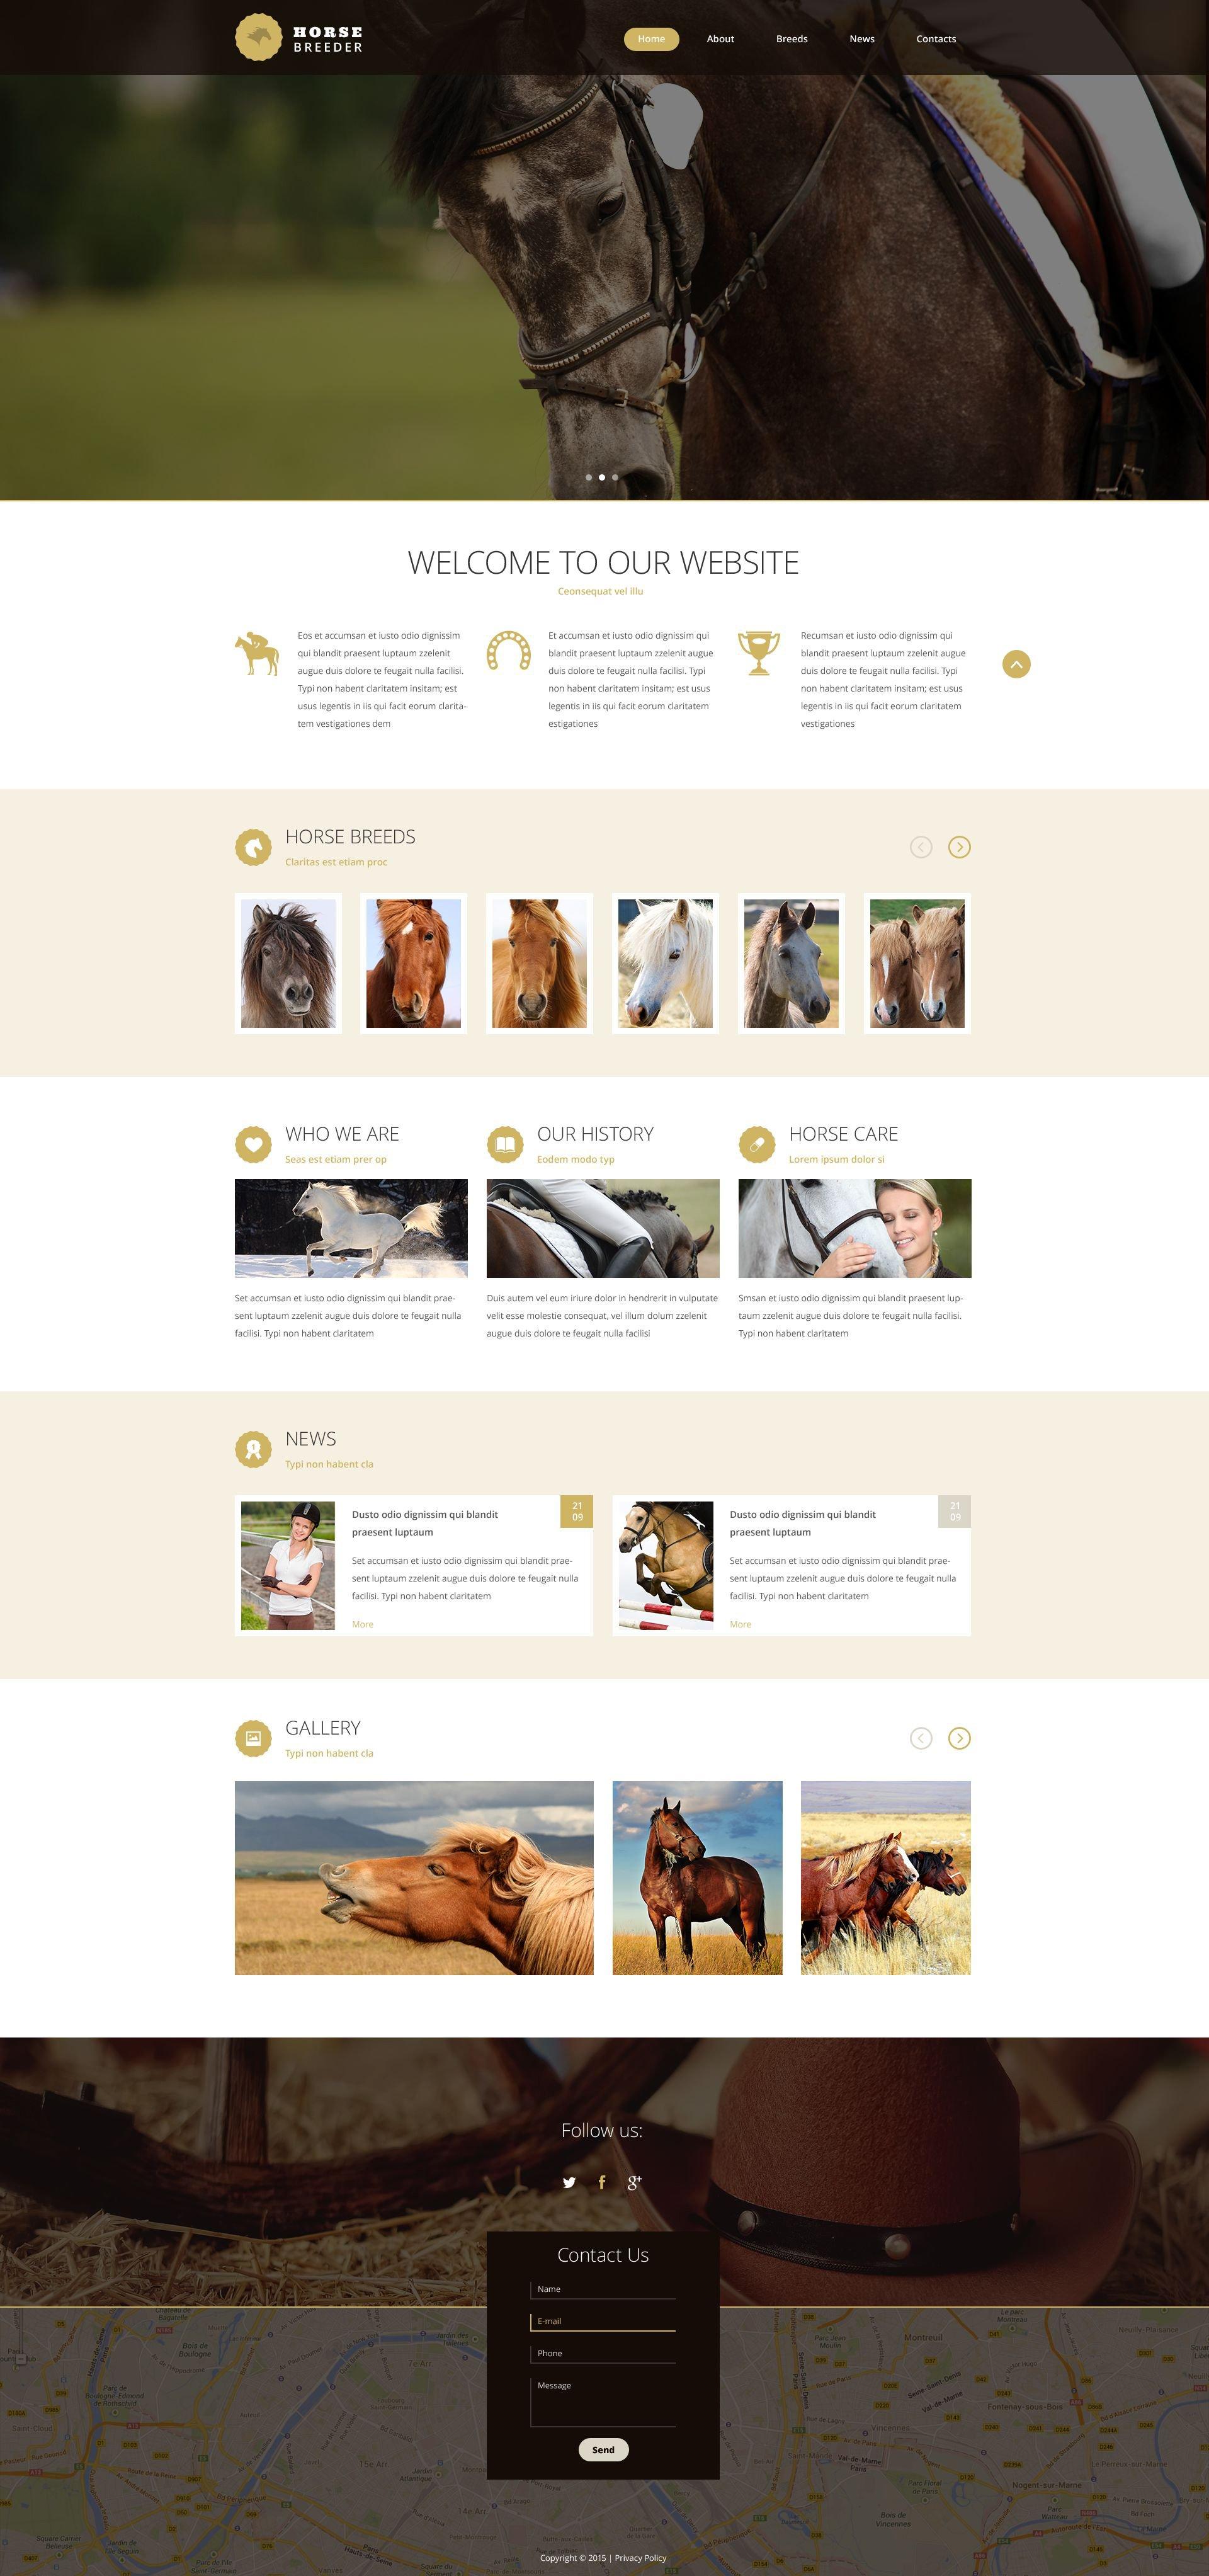 Reszponzív Horse Breeder Weboldal sablon 53786